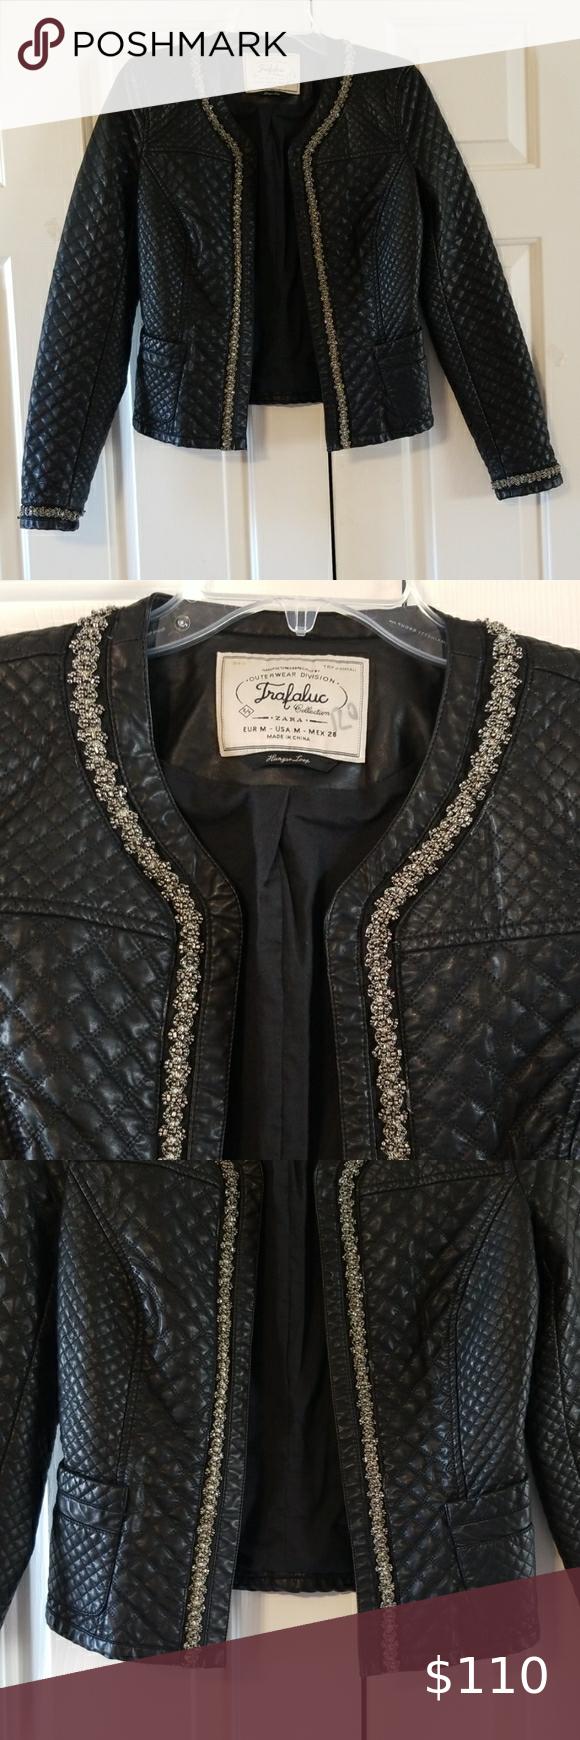 Zara Trafaluc Faux Leather Jacket Faux Leather Jackets Clothes Design Zara Leather Jacket [ 1740 x 580 Pixel ]